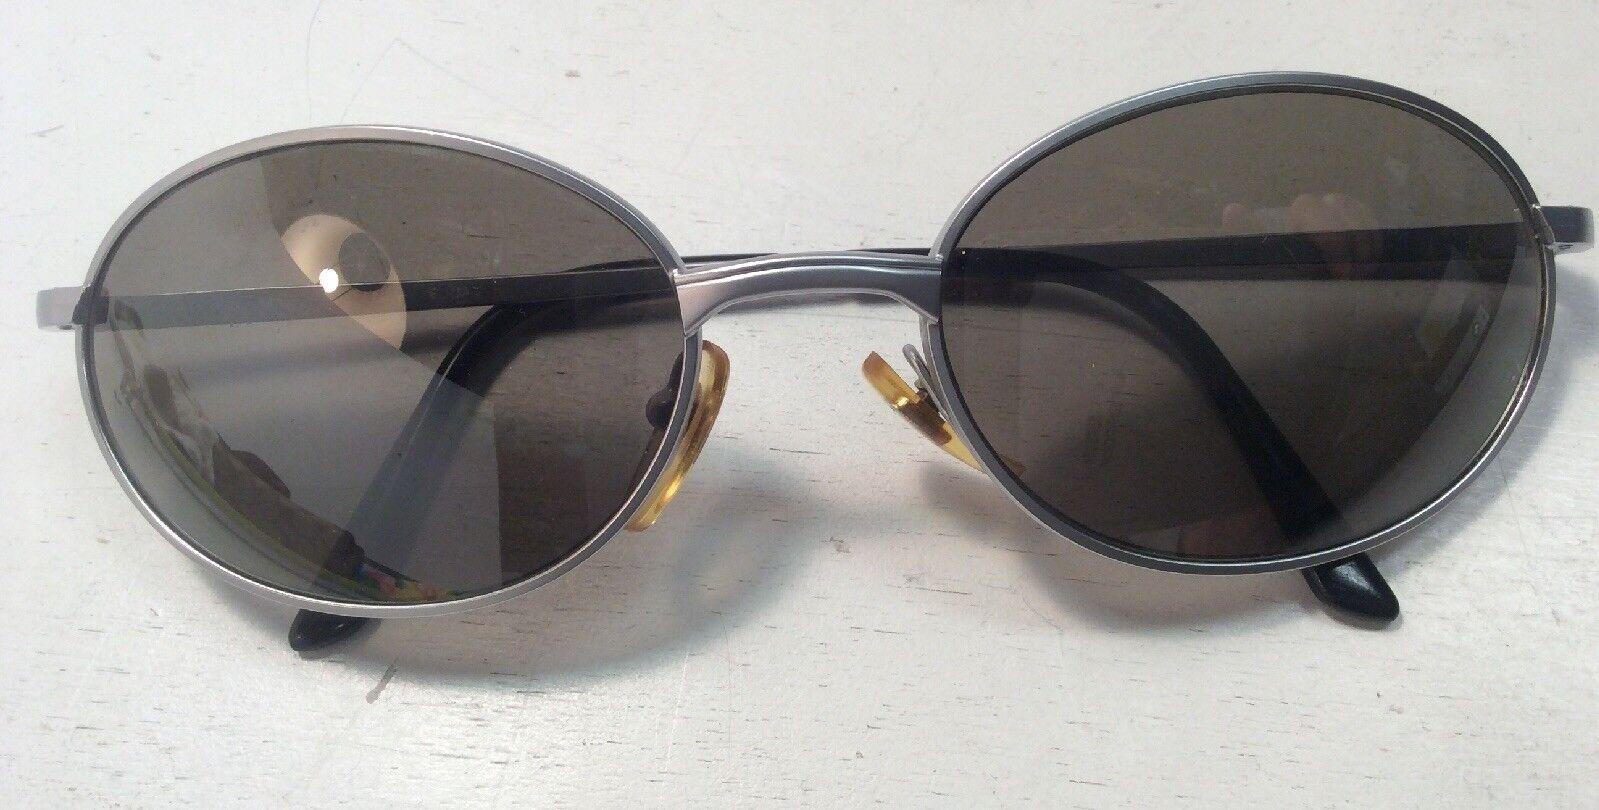 Bolle Sunglasses Shades Wire Metal Frame RecycledFashionShop.com